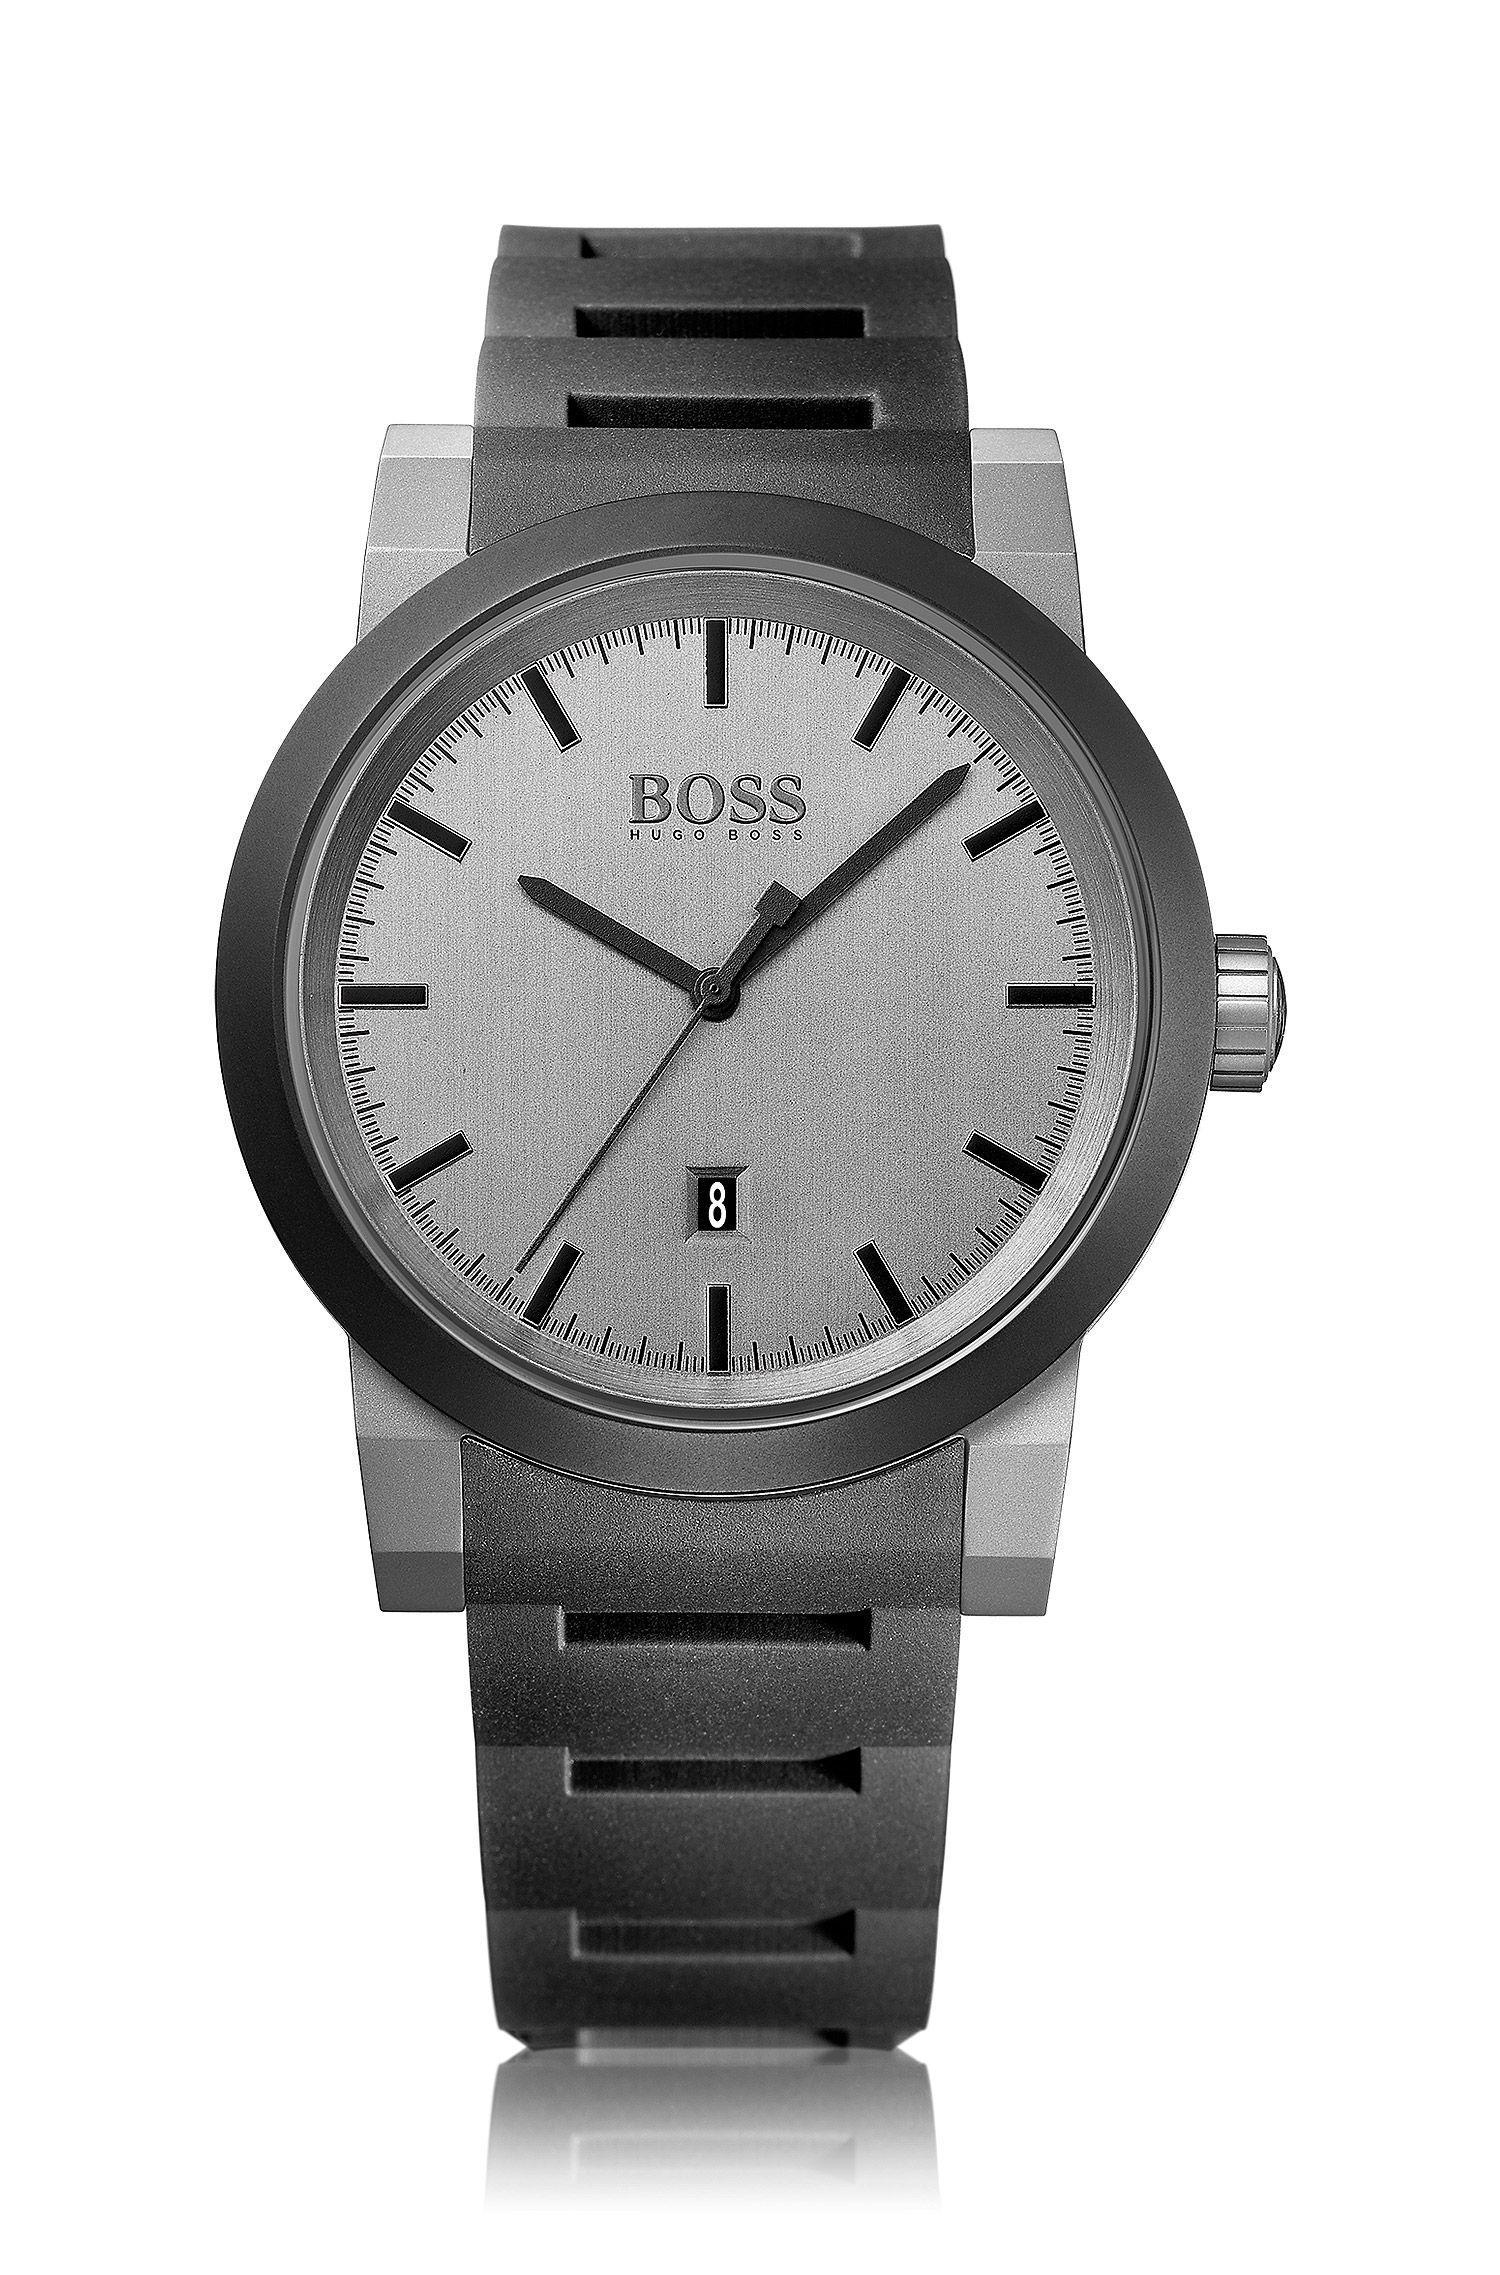 Montre-bracelet «HB6025» avec boîtier en acier inoxydable